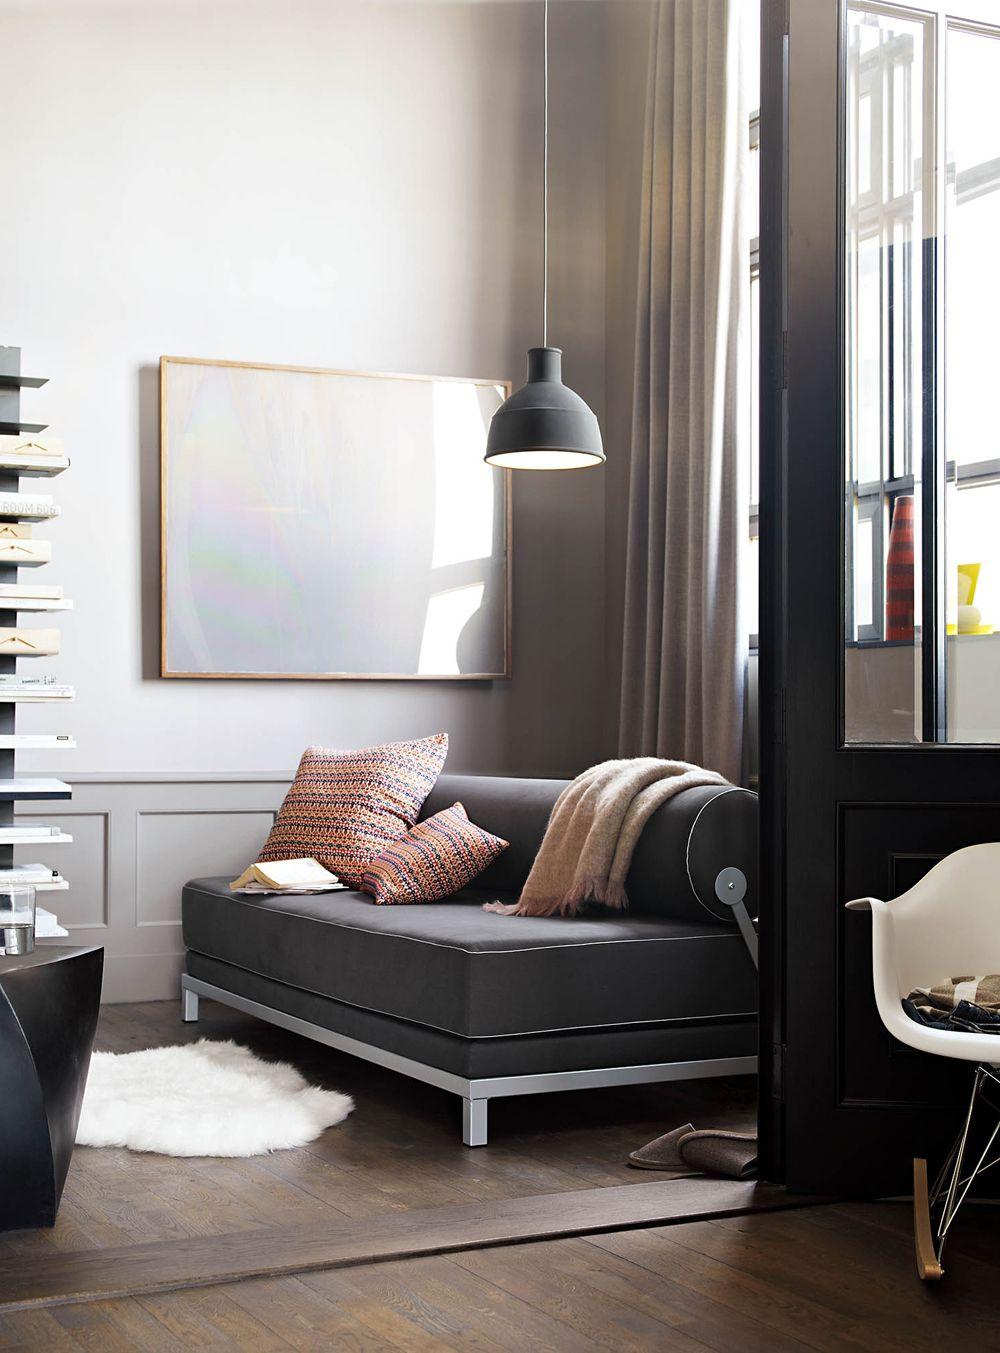 Phenomenal Twilight Sleeper Sofa Designed By Flemming Busk The Twilight Beatyapartments Chair Design Images Beatyapartmentscom